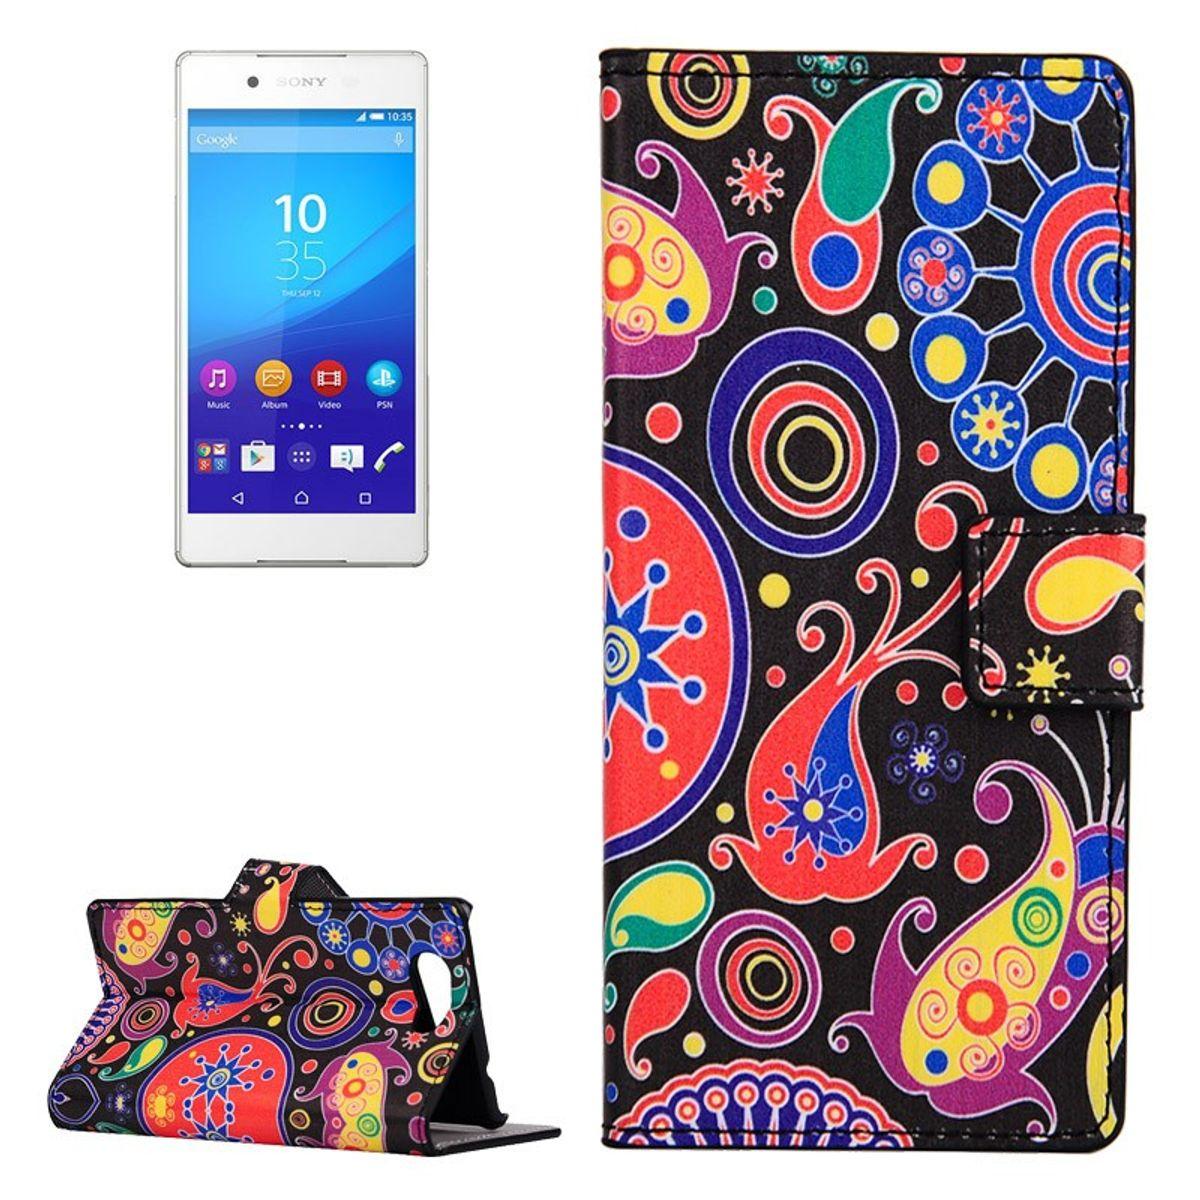 Handyhülle Tasche für Handy Sony Xperia Z4 Compact Farbflash LSD